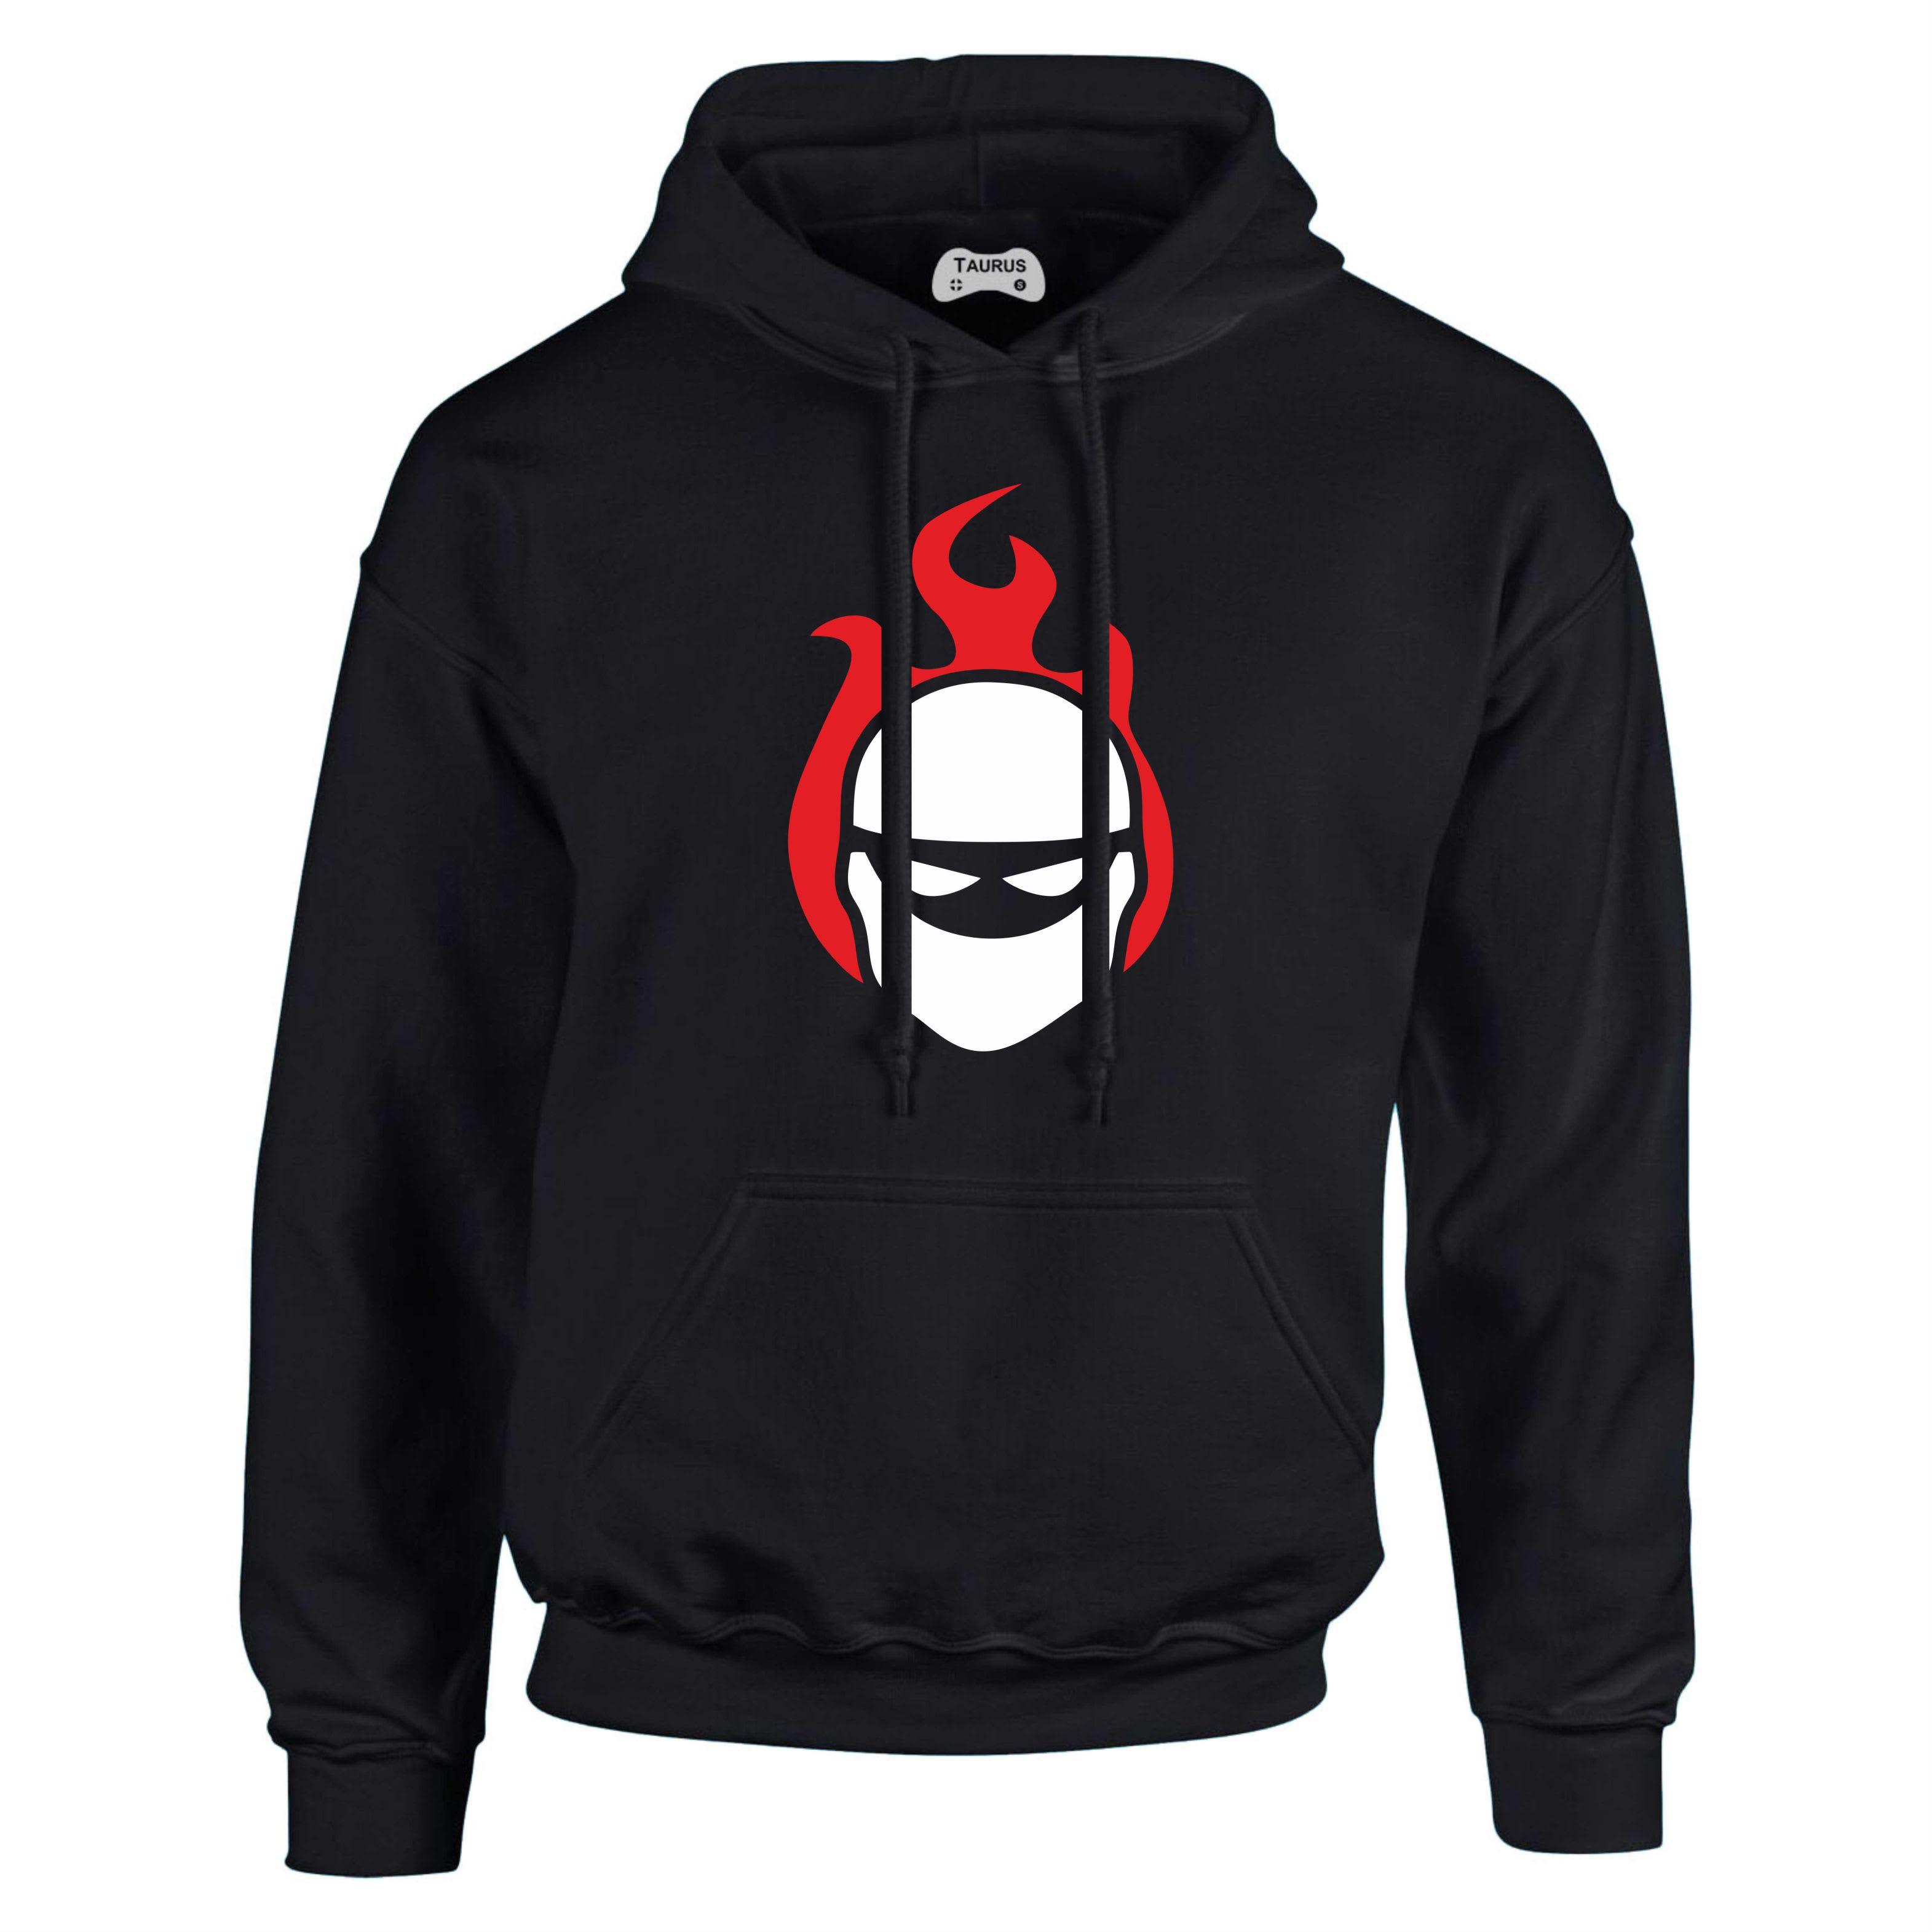 Halo Hoodie Flaming Ninja